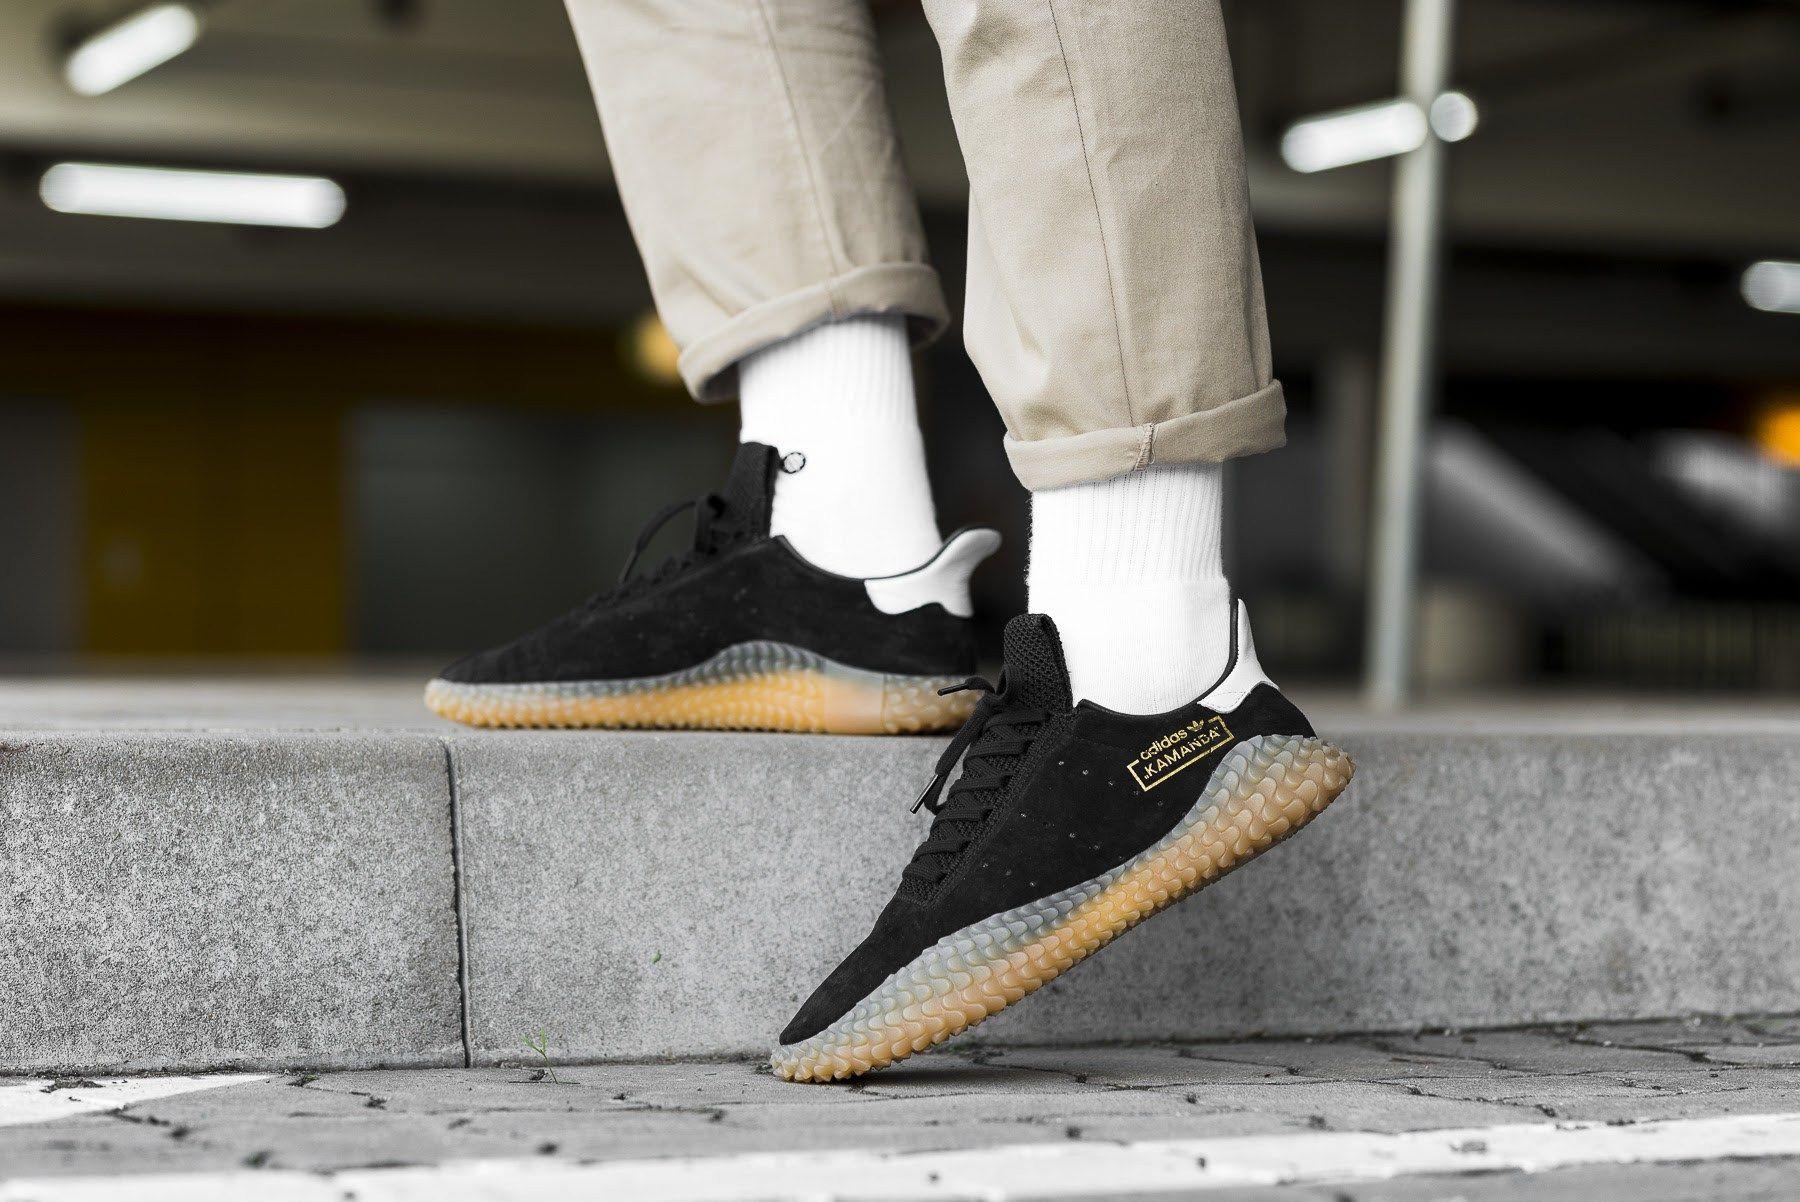 new concept a6717 92c48 adidas Kamanda  On-Foot in Two Colorways - EU Kicks  Sneaker Magazine